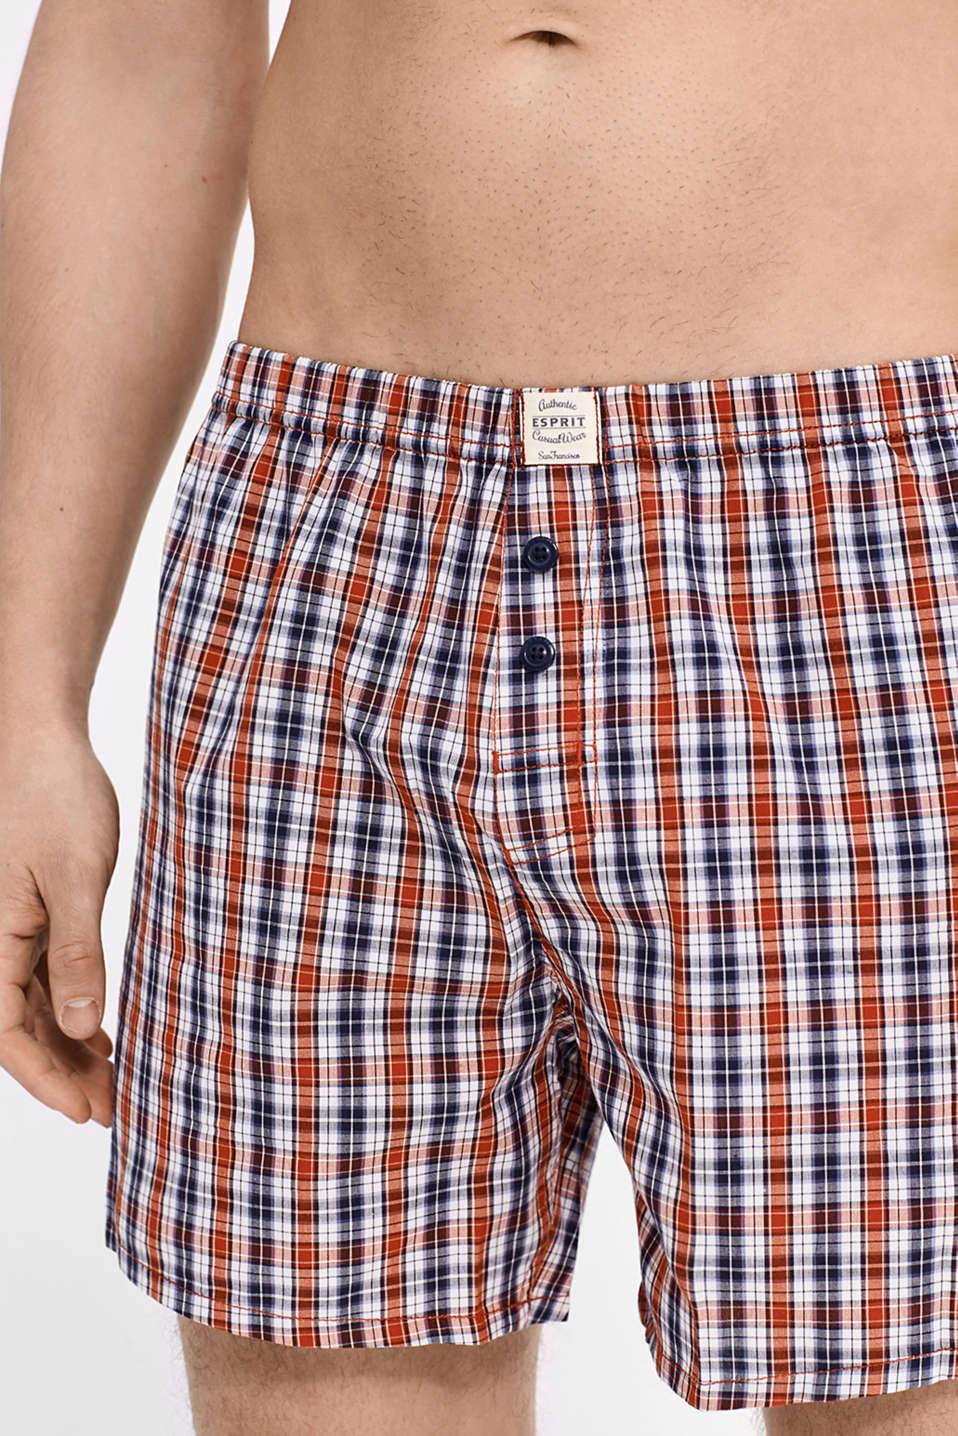 esprit woven boxer shorts 100 cotton at our online shop. Black Bedroom Furniture Sets. Home Design Ideas